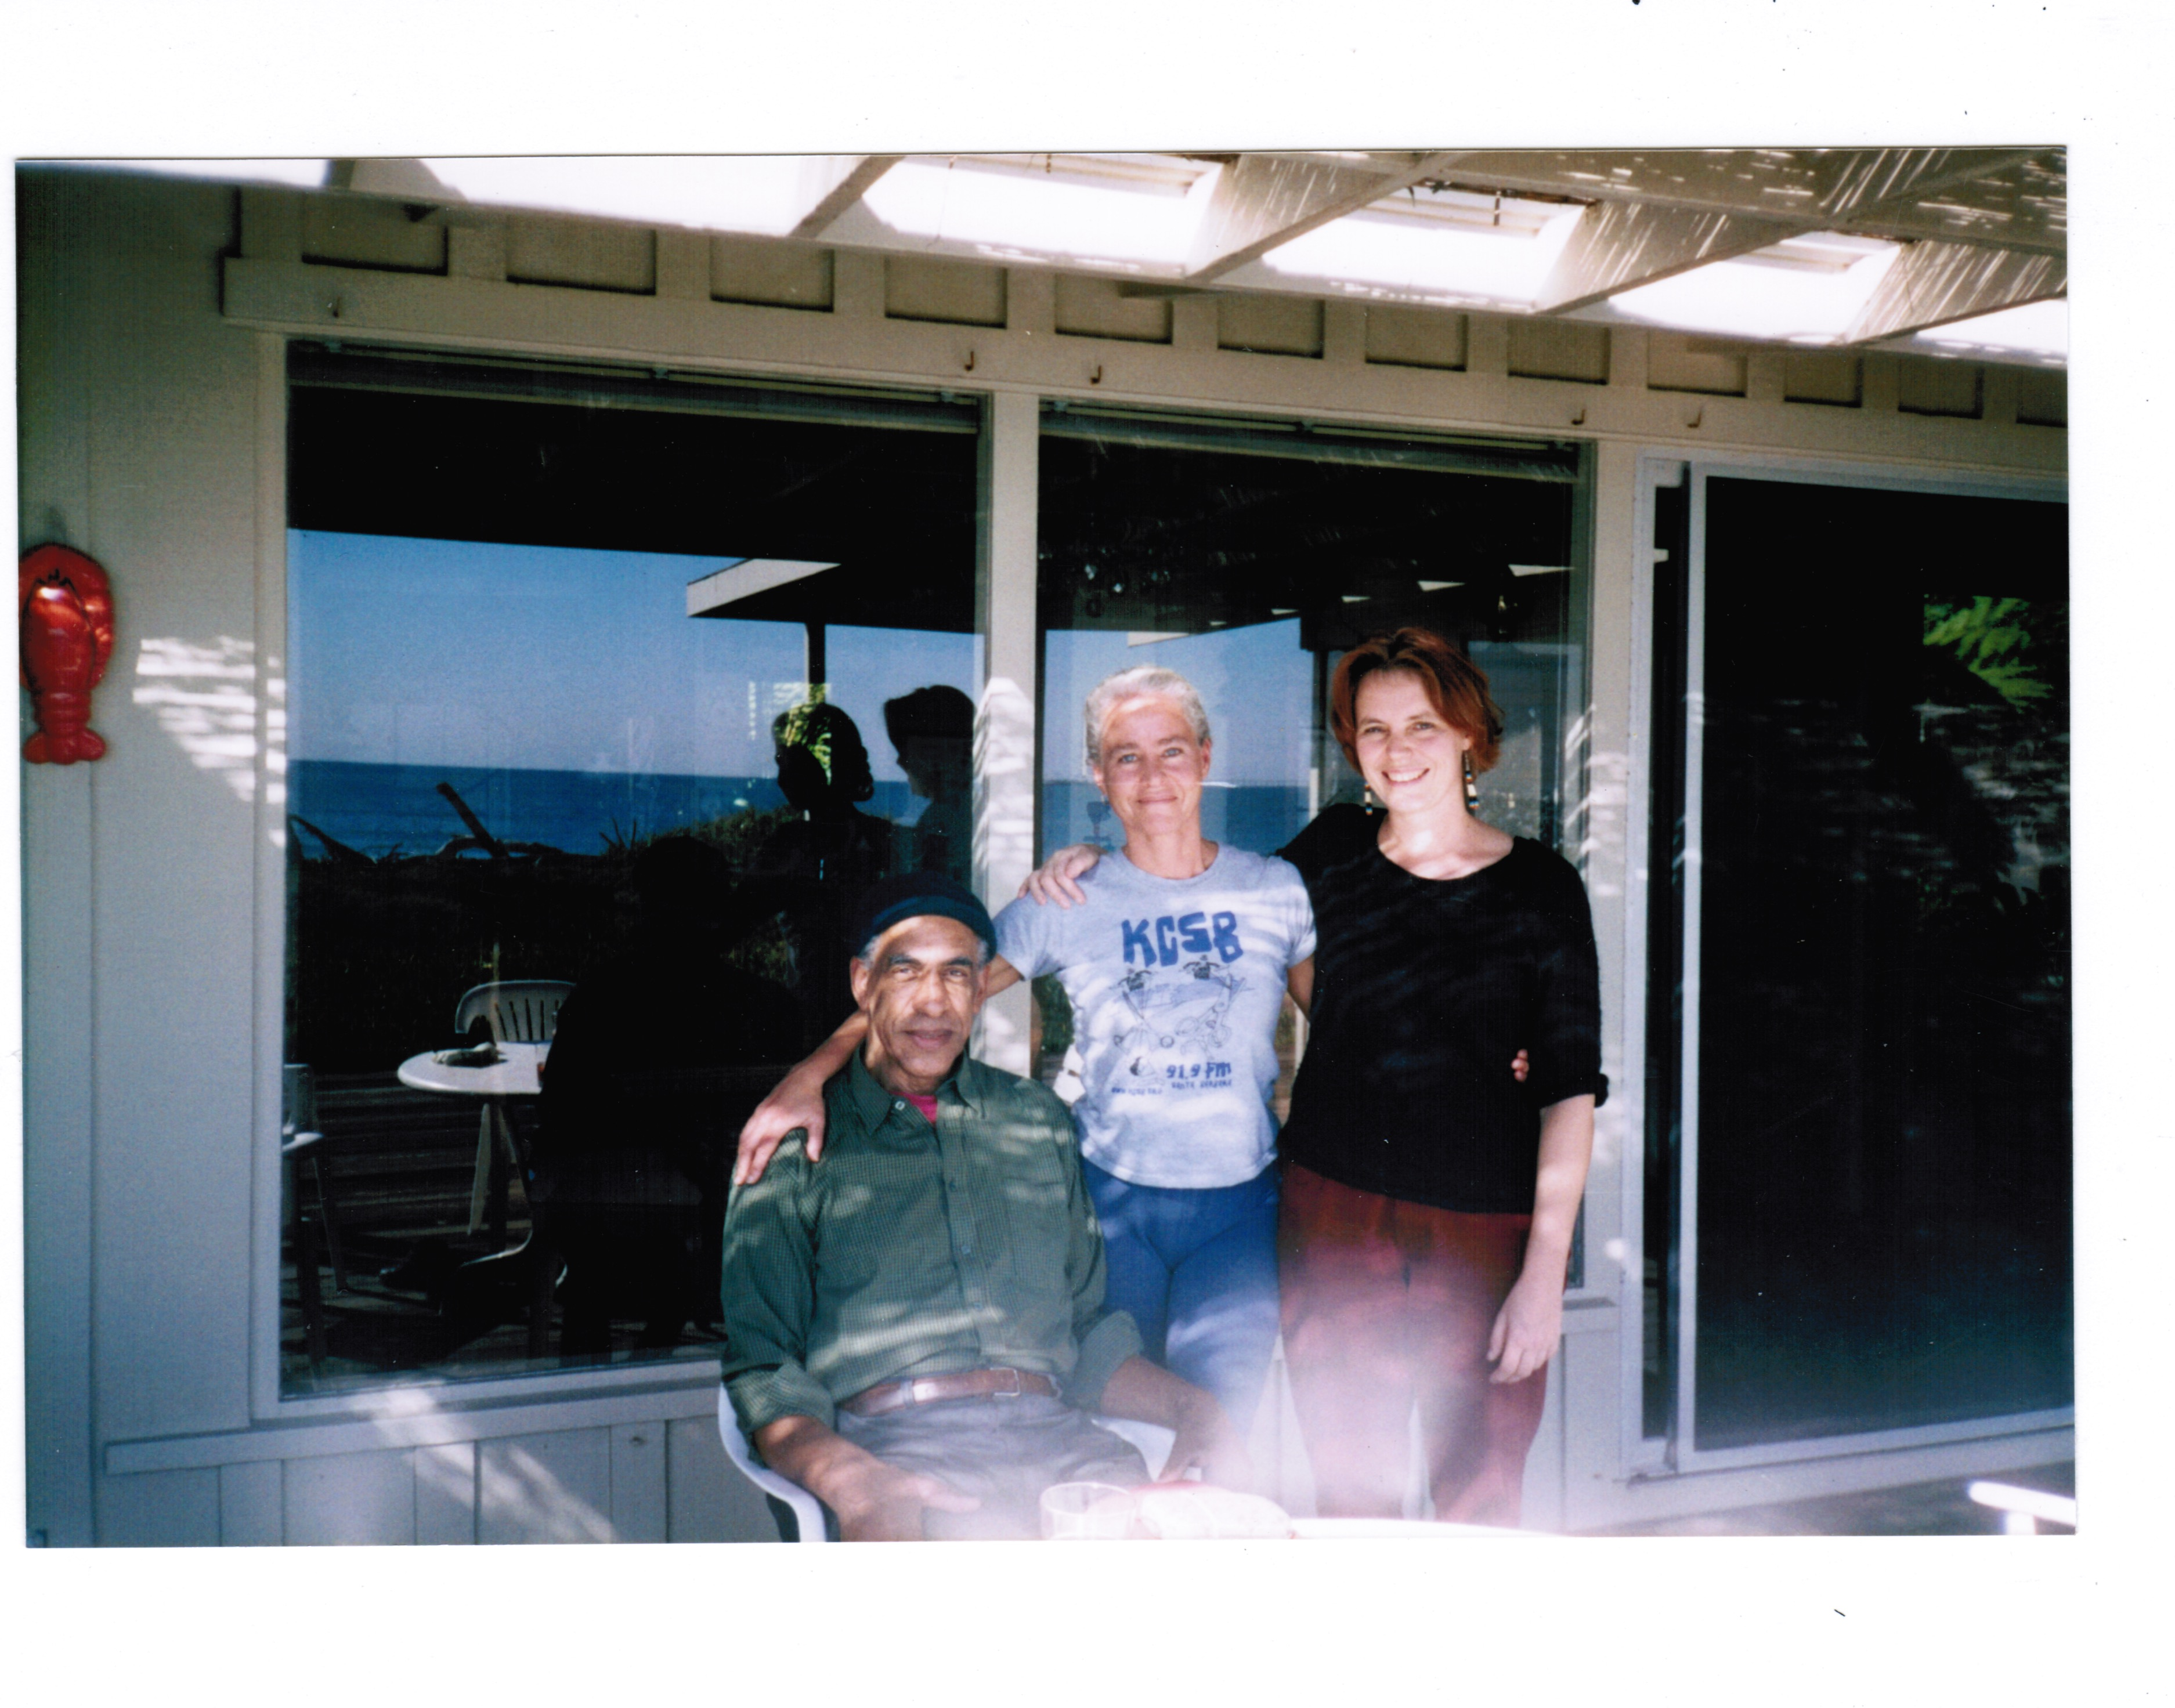 John Tchicai, Marta Ulvaeus, Margriet Naber at Rincon Point, CA.jpeg